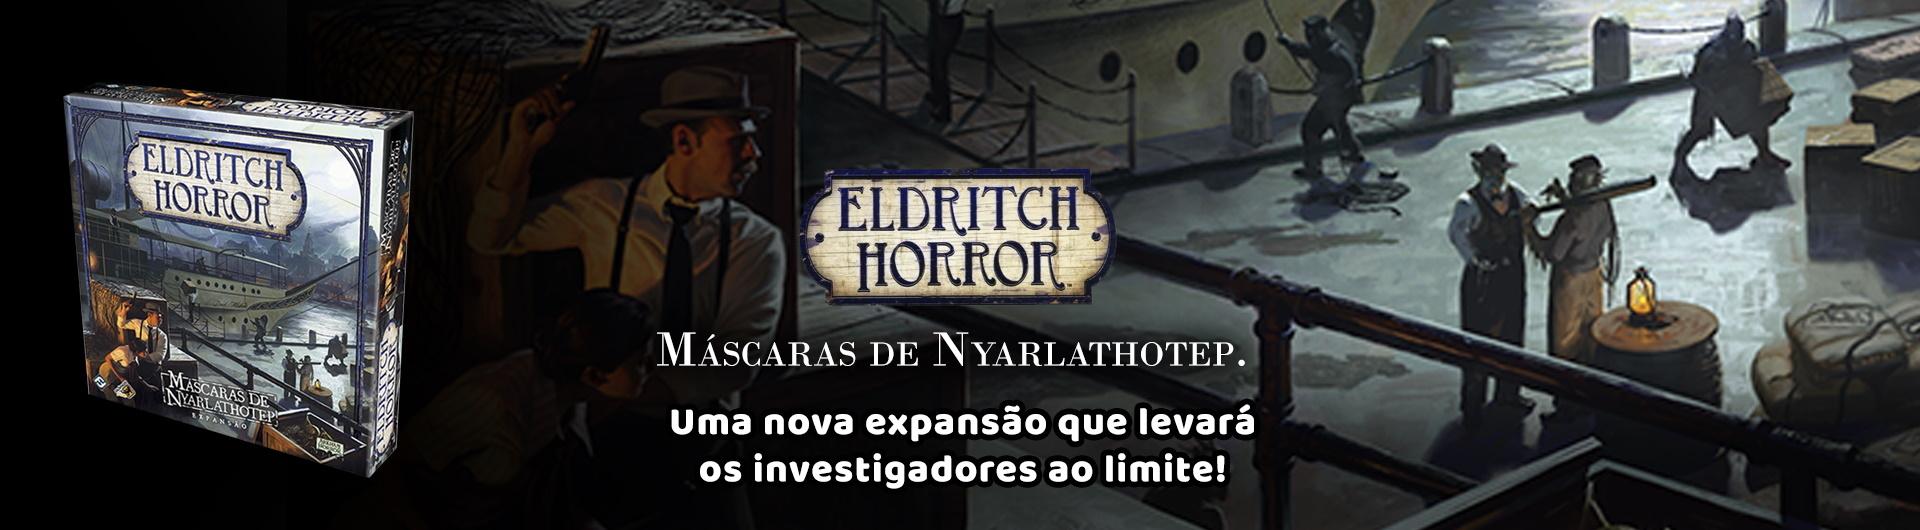 eldritch-horror-mascaras-nyarlathotep